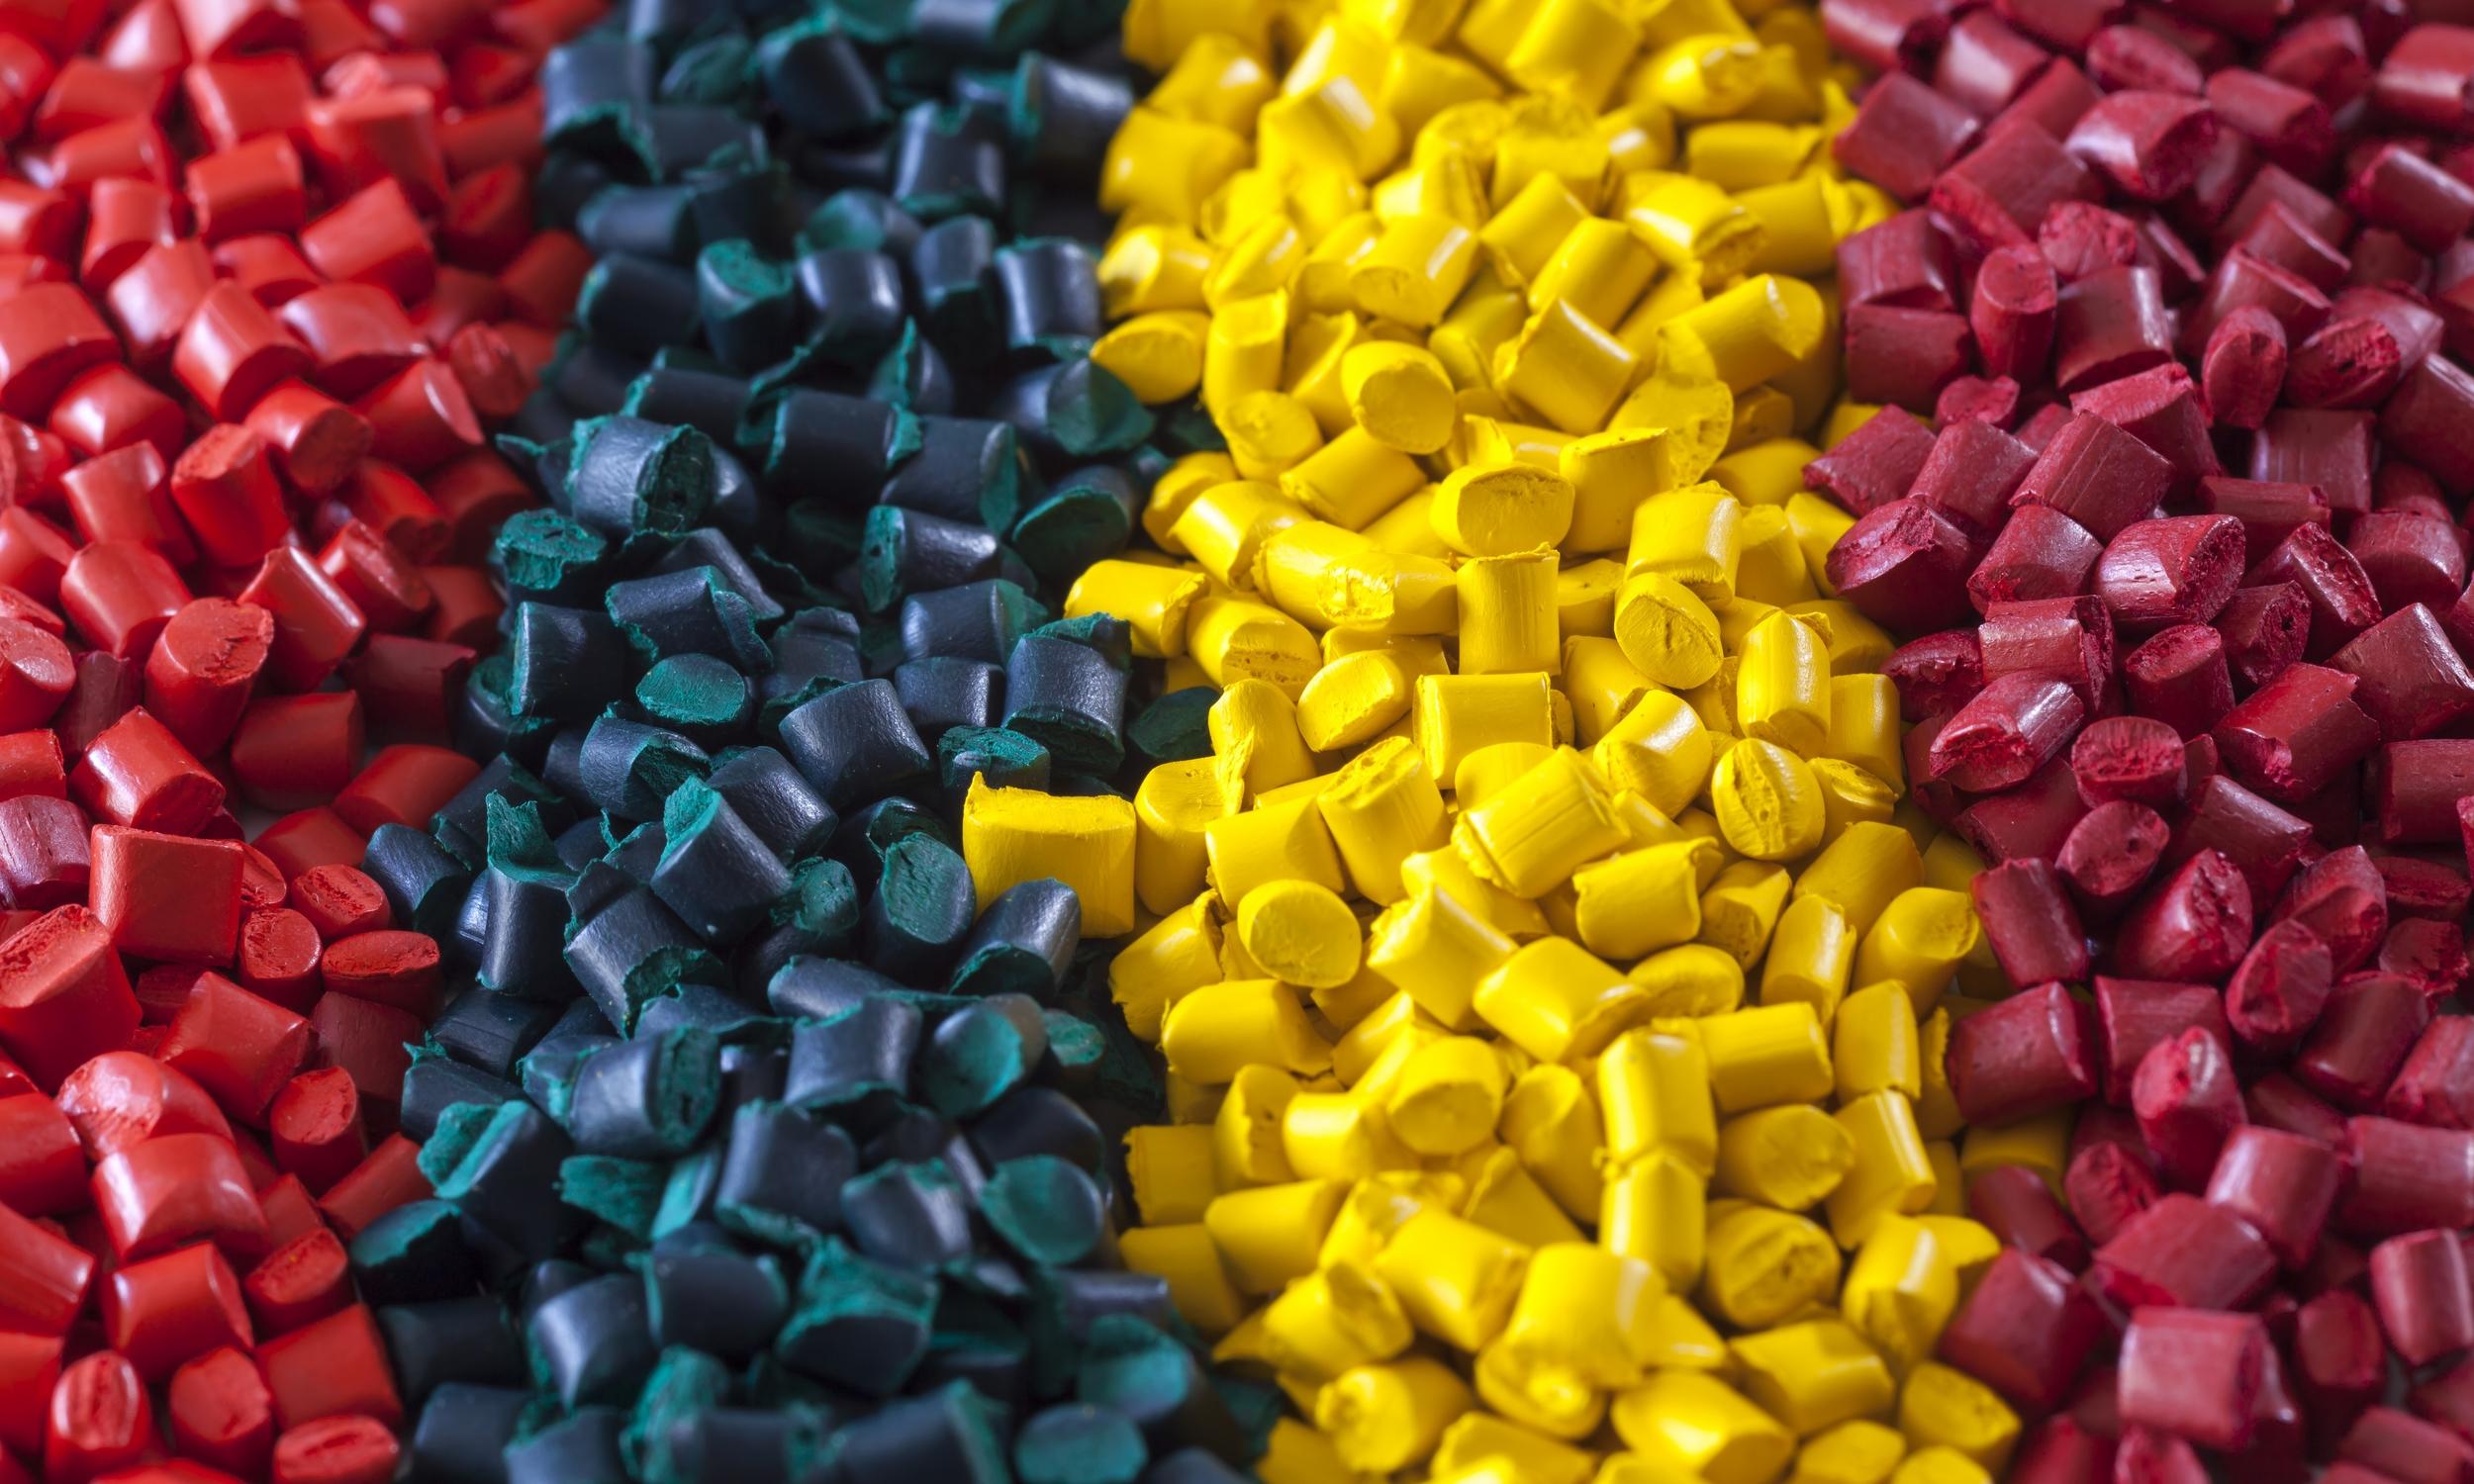 philpott-industrial-plastics.jpg